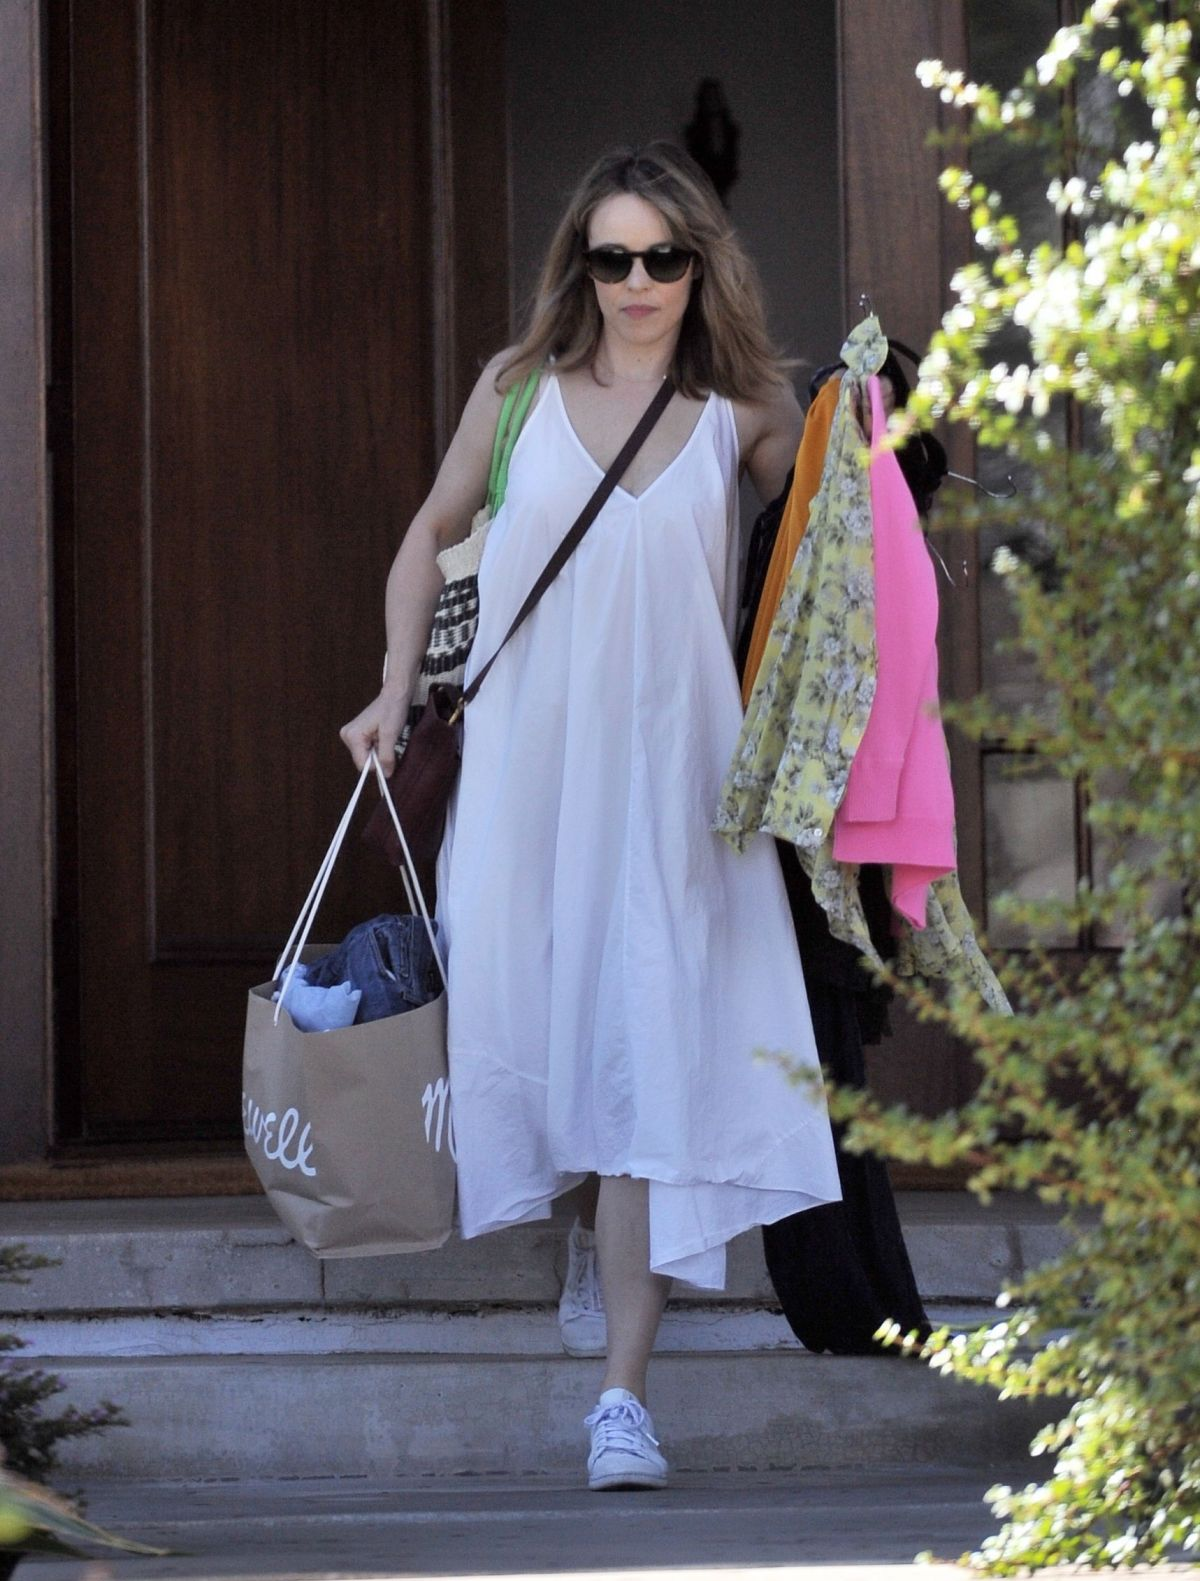 Rachel Mcadams Out In Los Angeles 10 01 2018